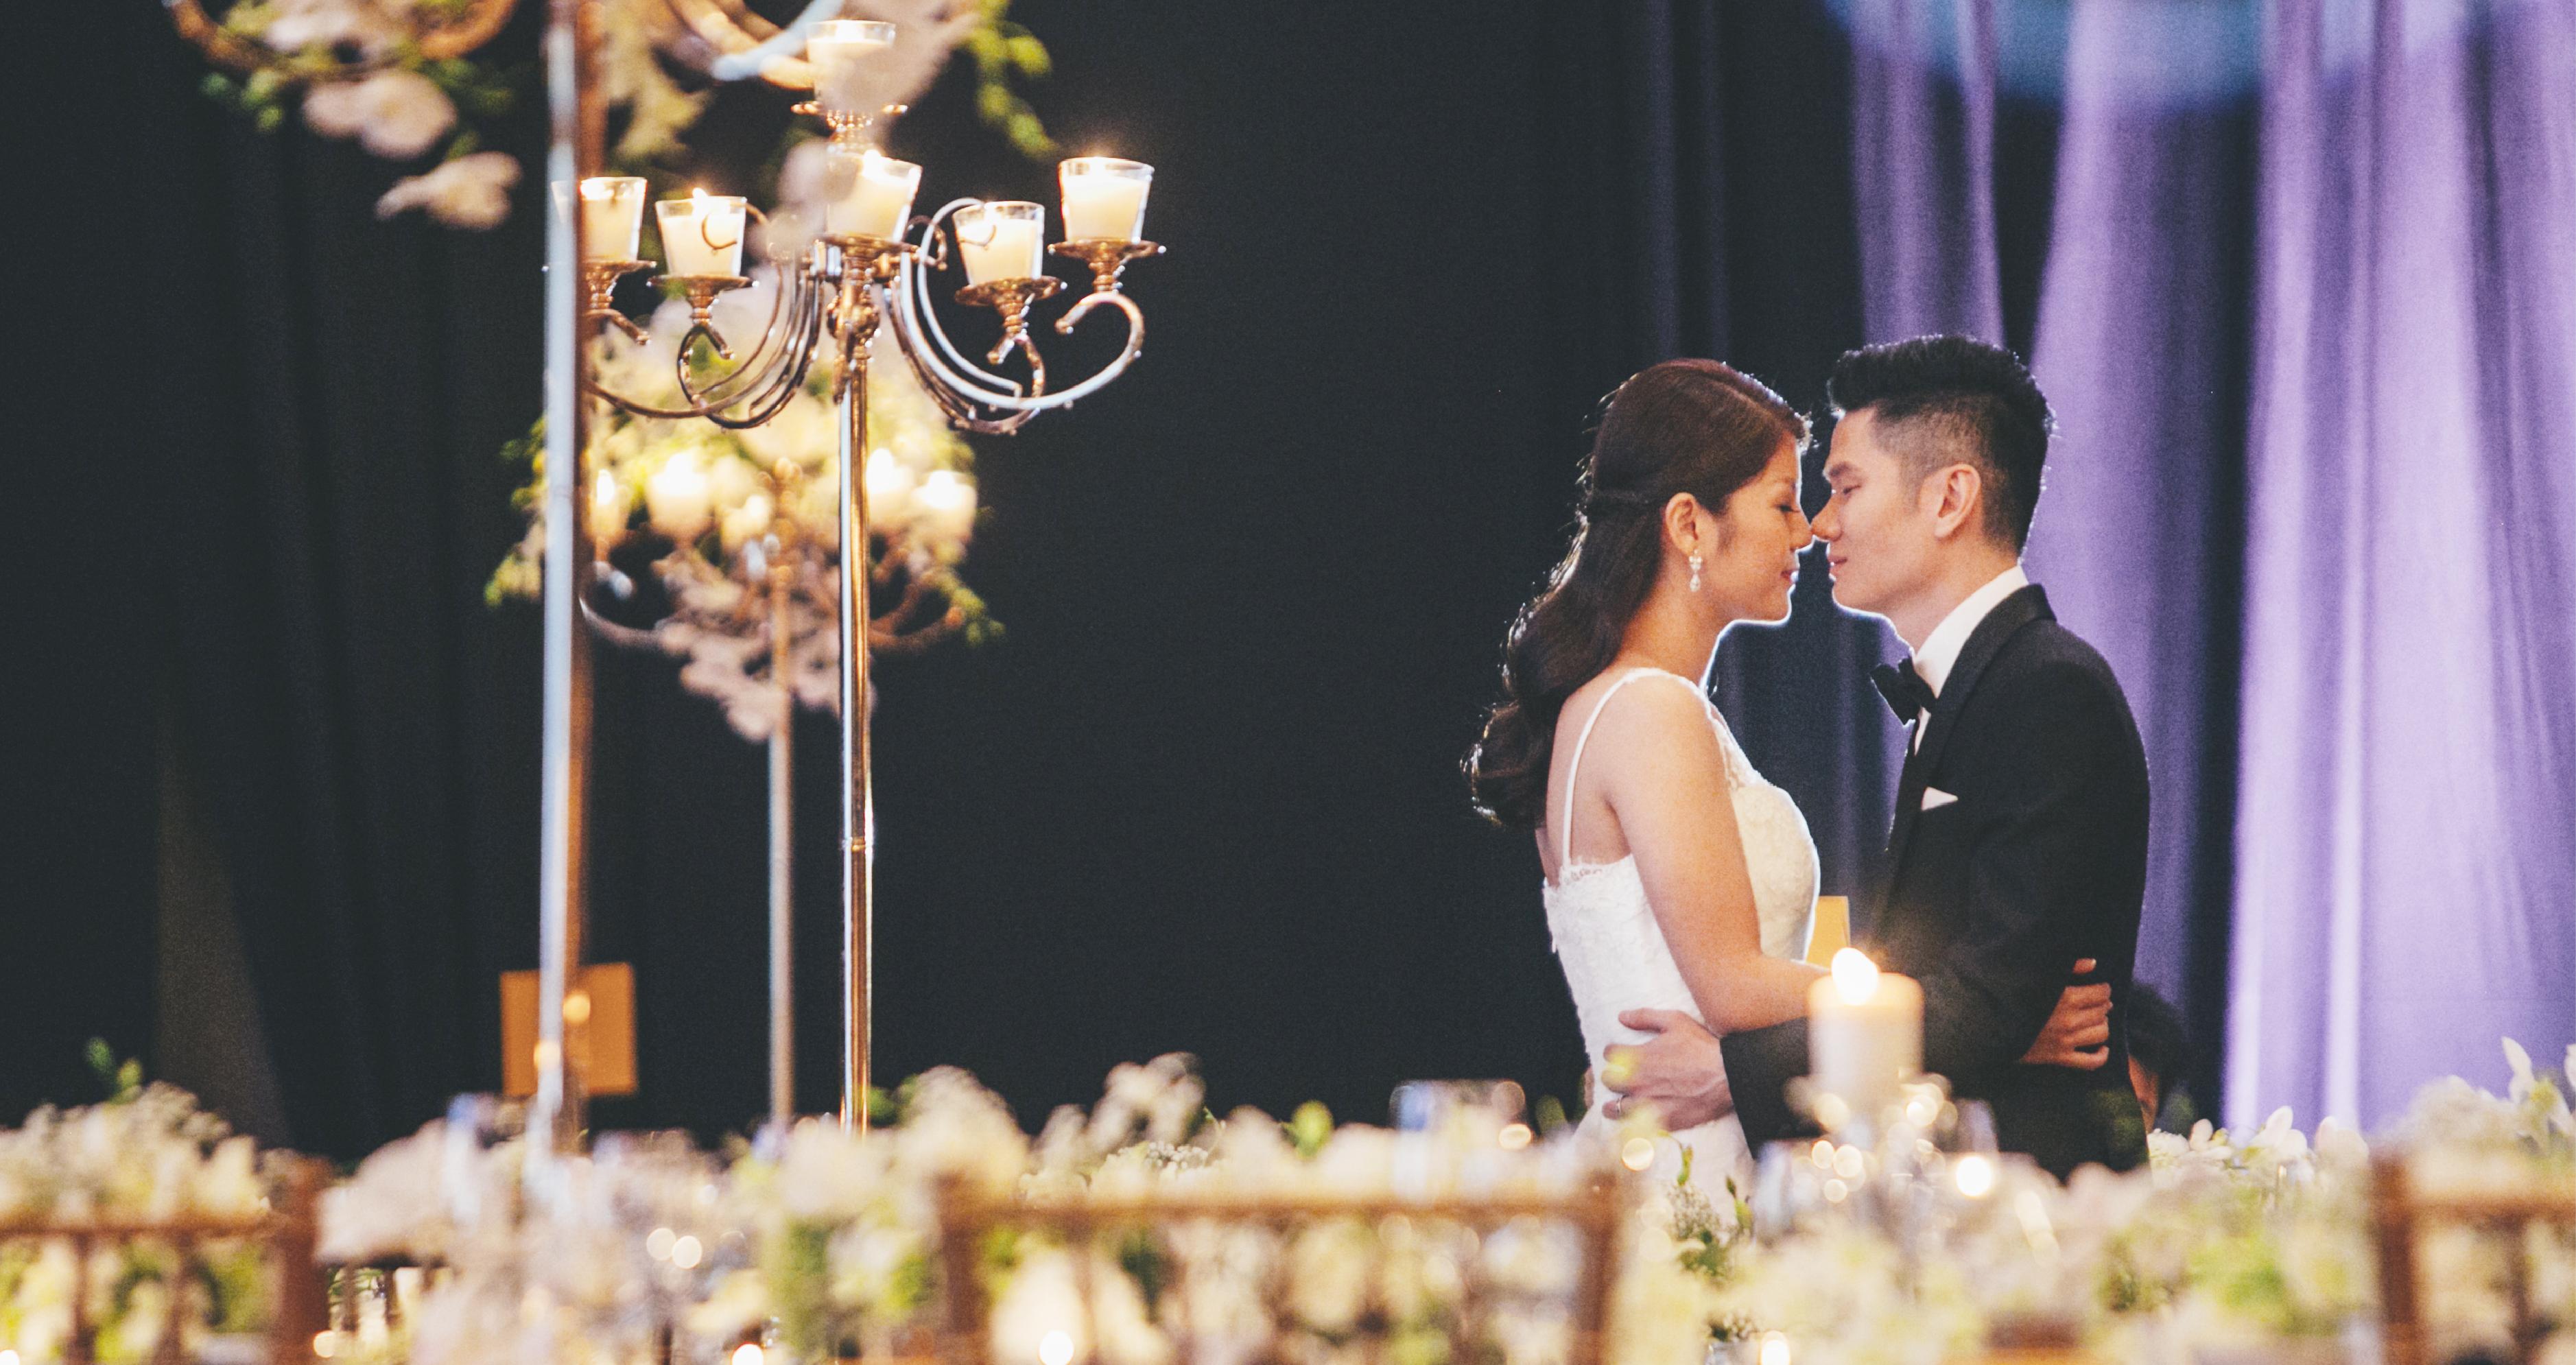 Hilton weddings